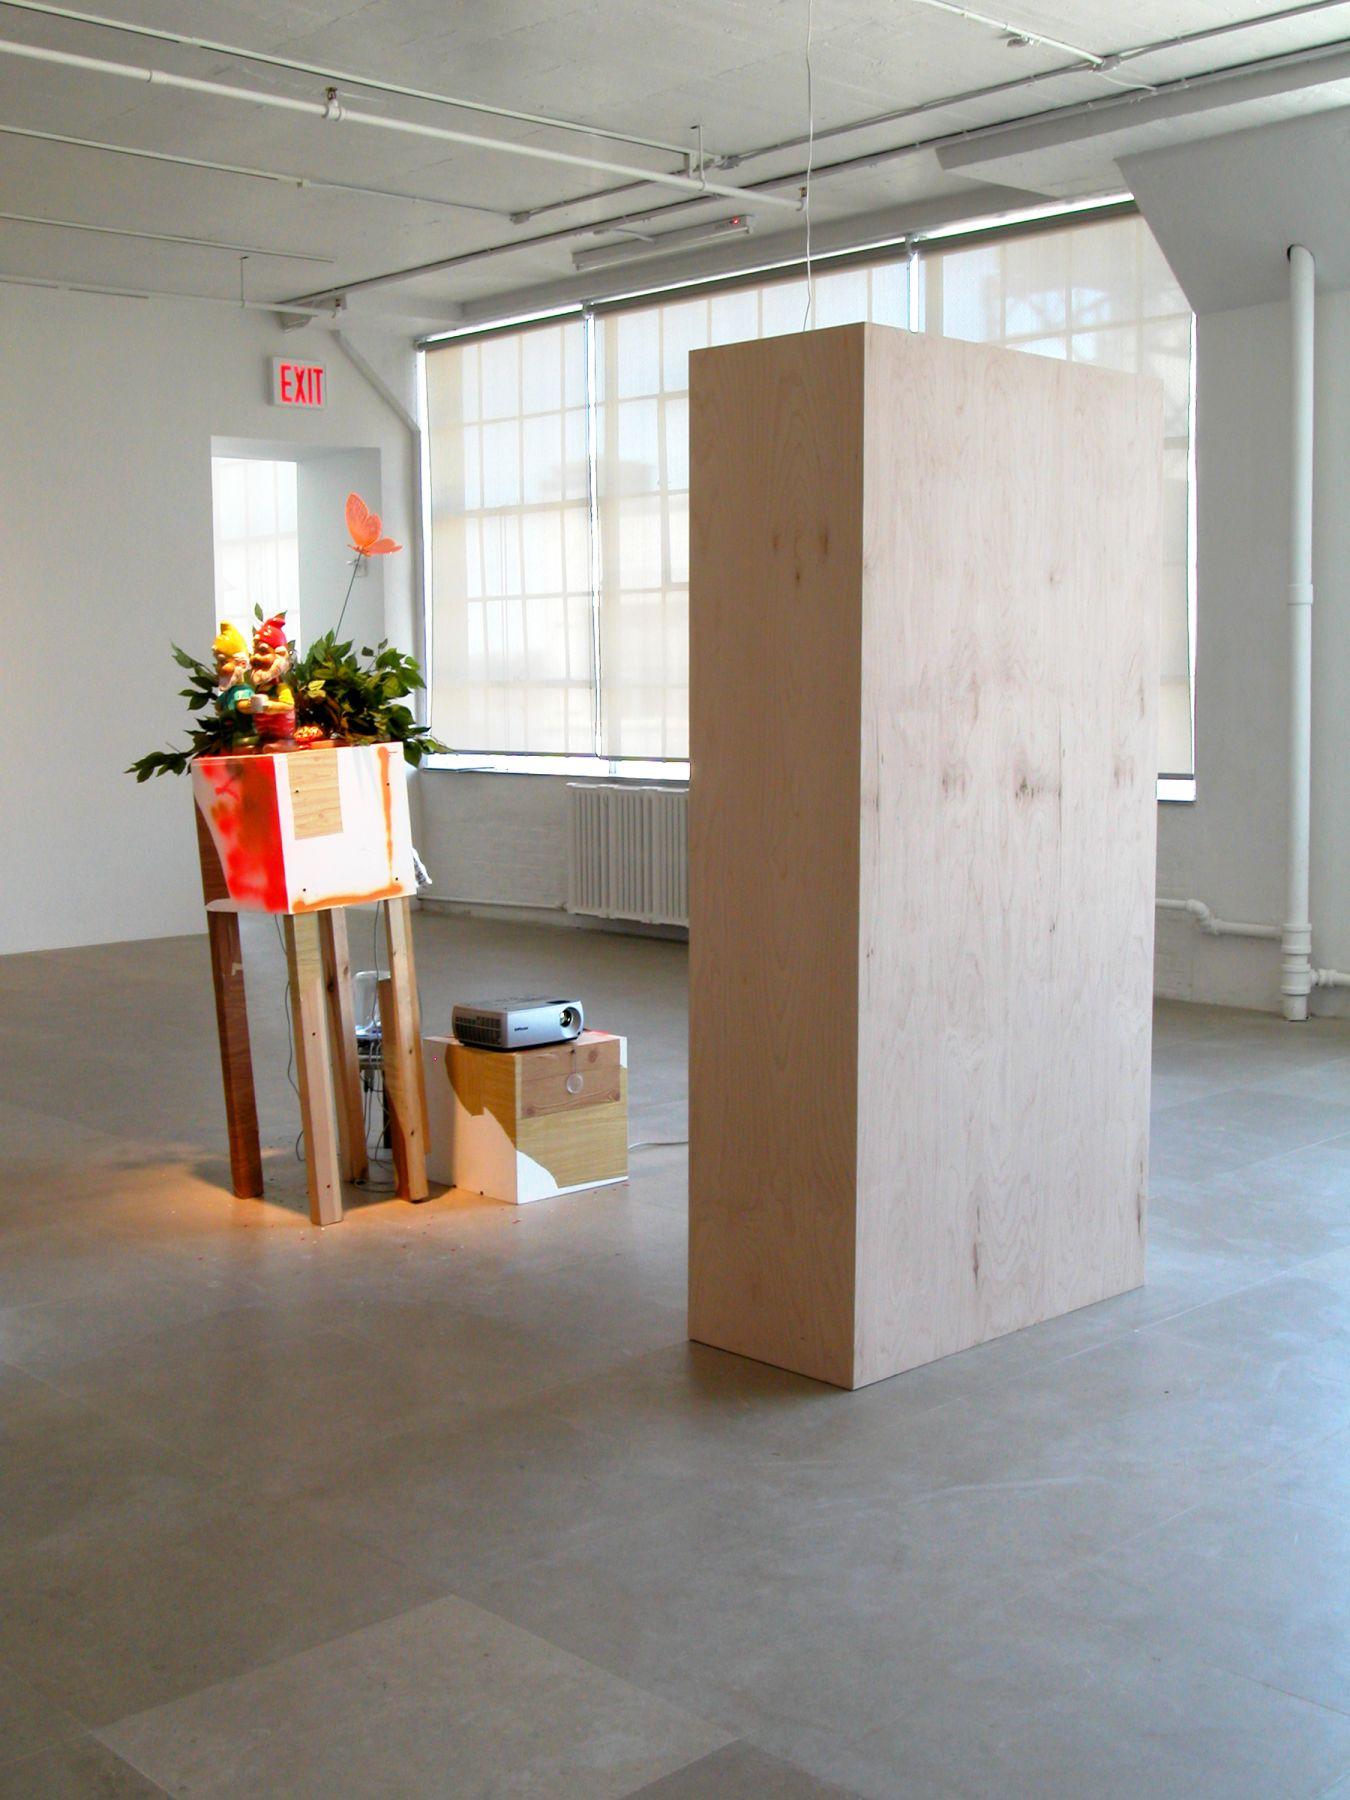 Rachel Harrison, Double Vision, 2006-2008, wood, shelf liner, metal, plastic, fake foliage, confetti, DVD player, projector, apple sound sticks, Simon LeBon mirrors, 78 x 36 x 18 inches